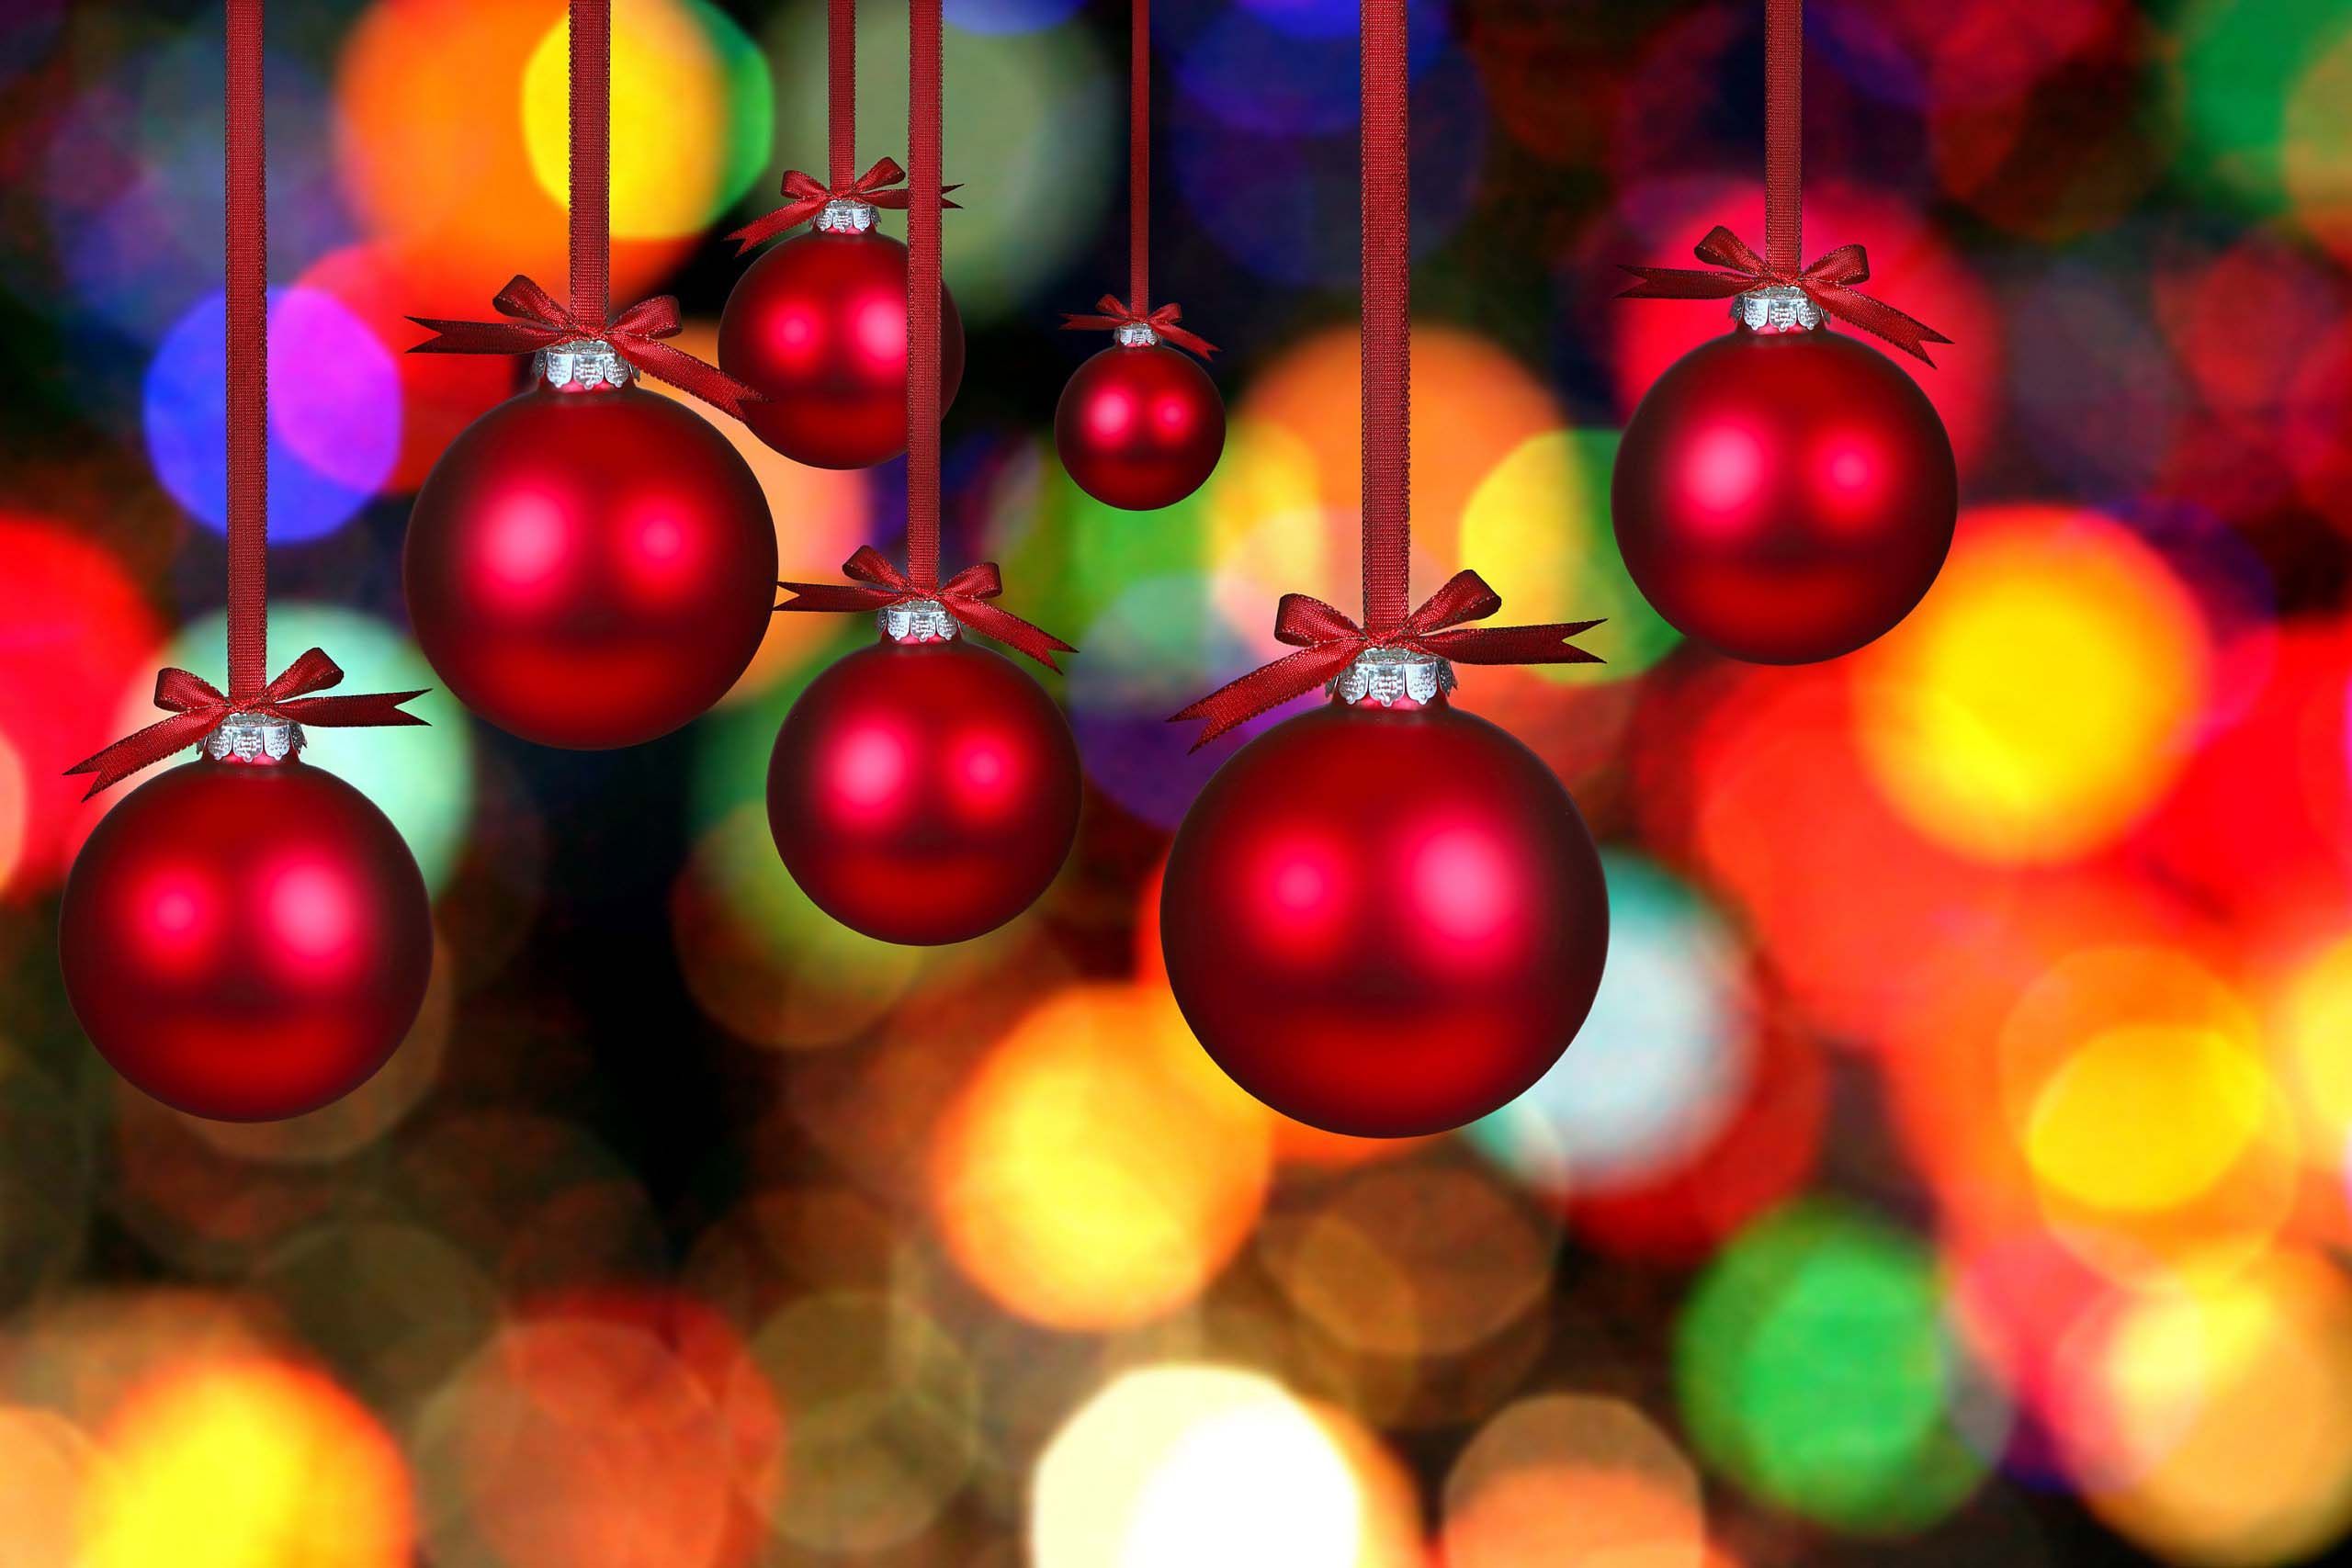 Colorful Christmas Balls.Free Photo Colorful Christmas Balls Red Reflection